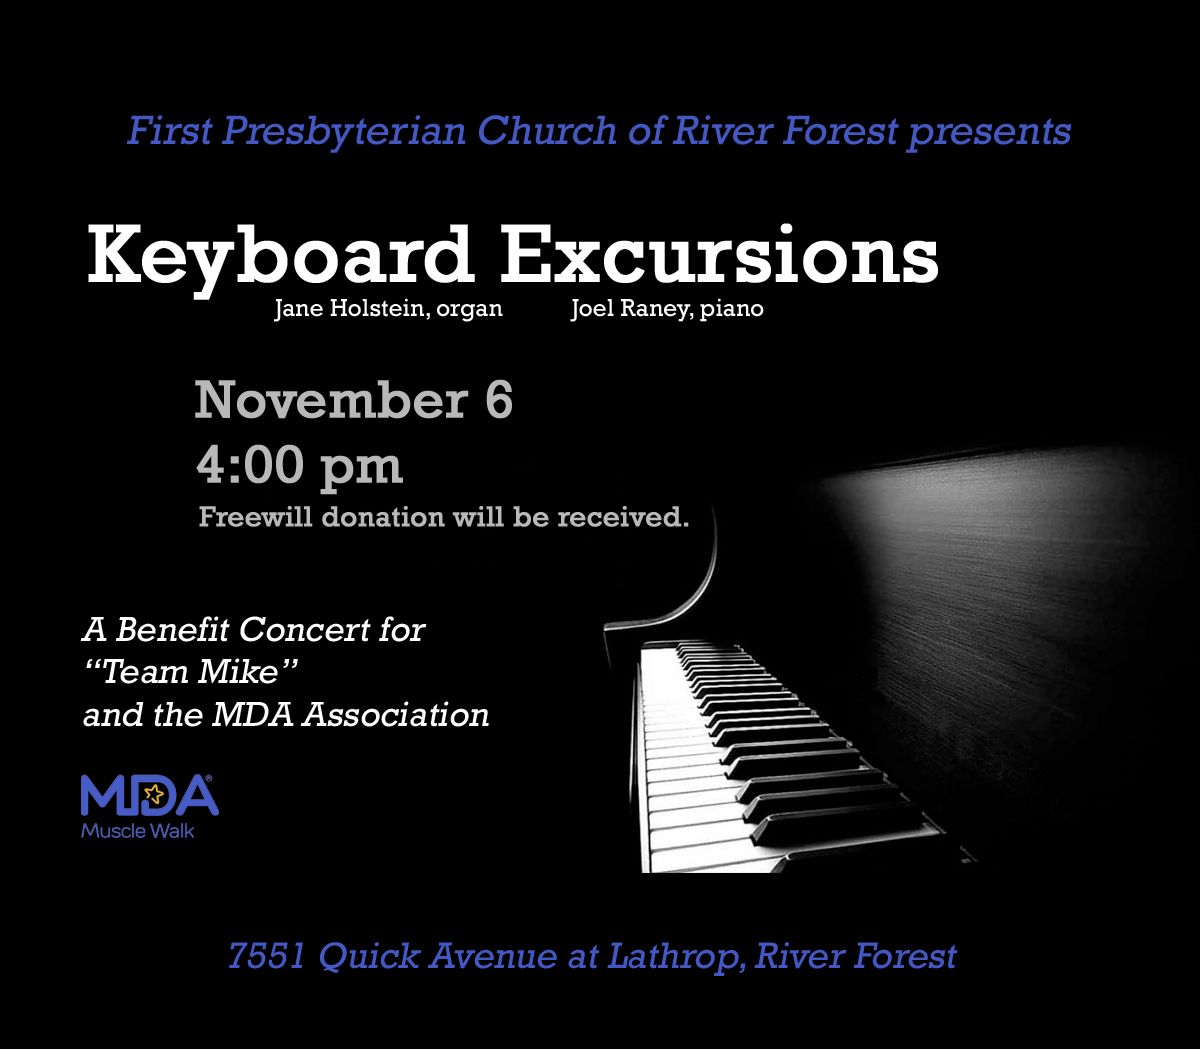 Keyboard Excursions